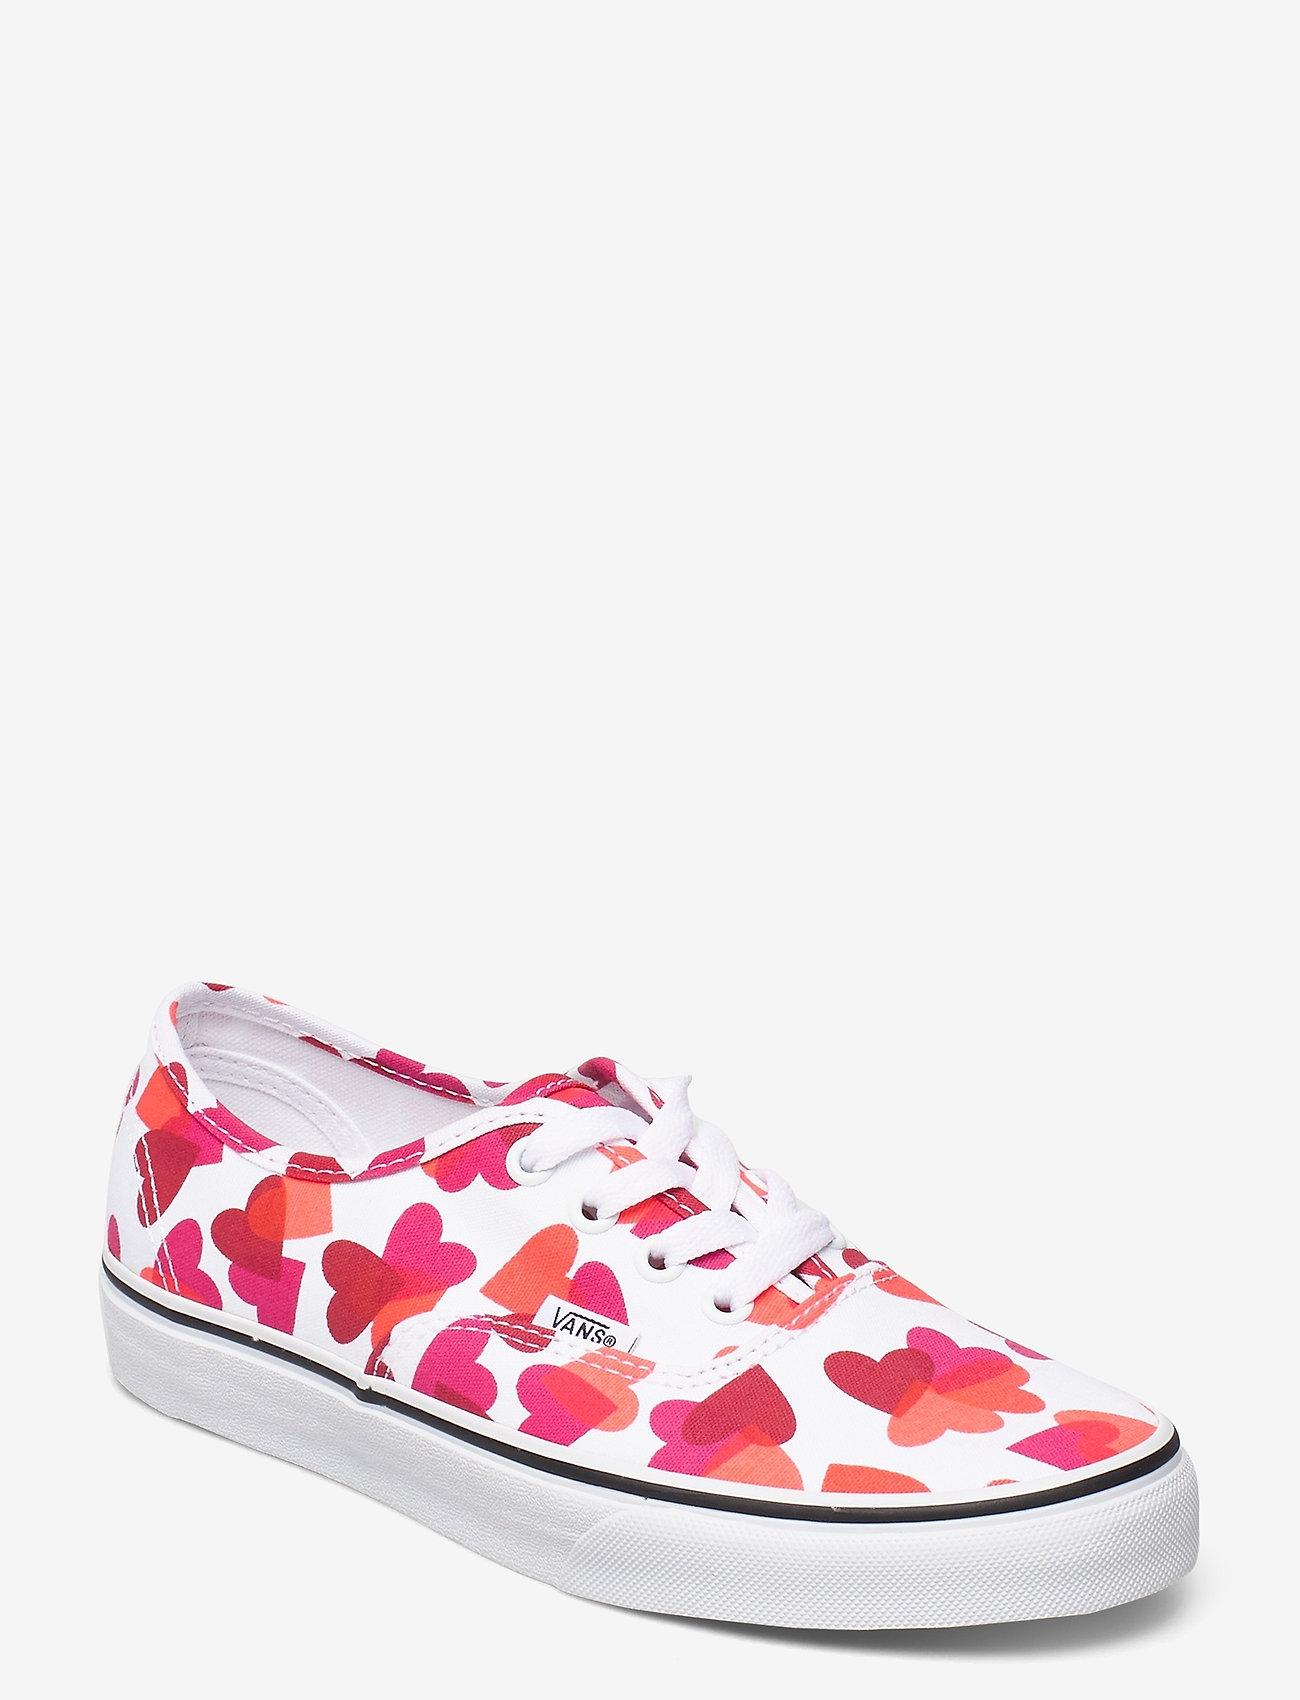 VANS - UA Authentic - lage sneakers - (valntnshrts)trwhtfchsprp - 0